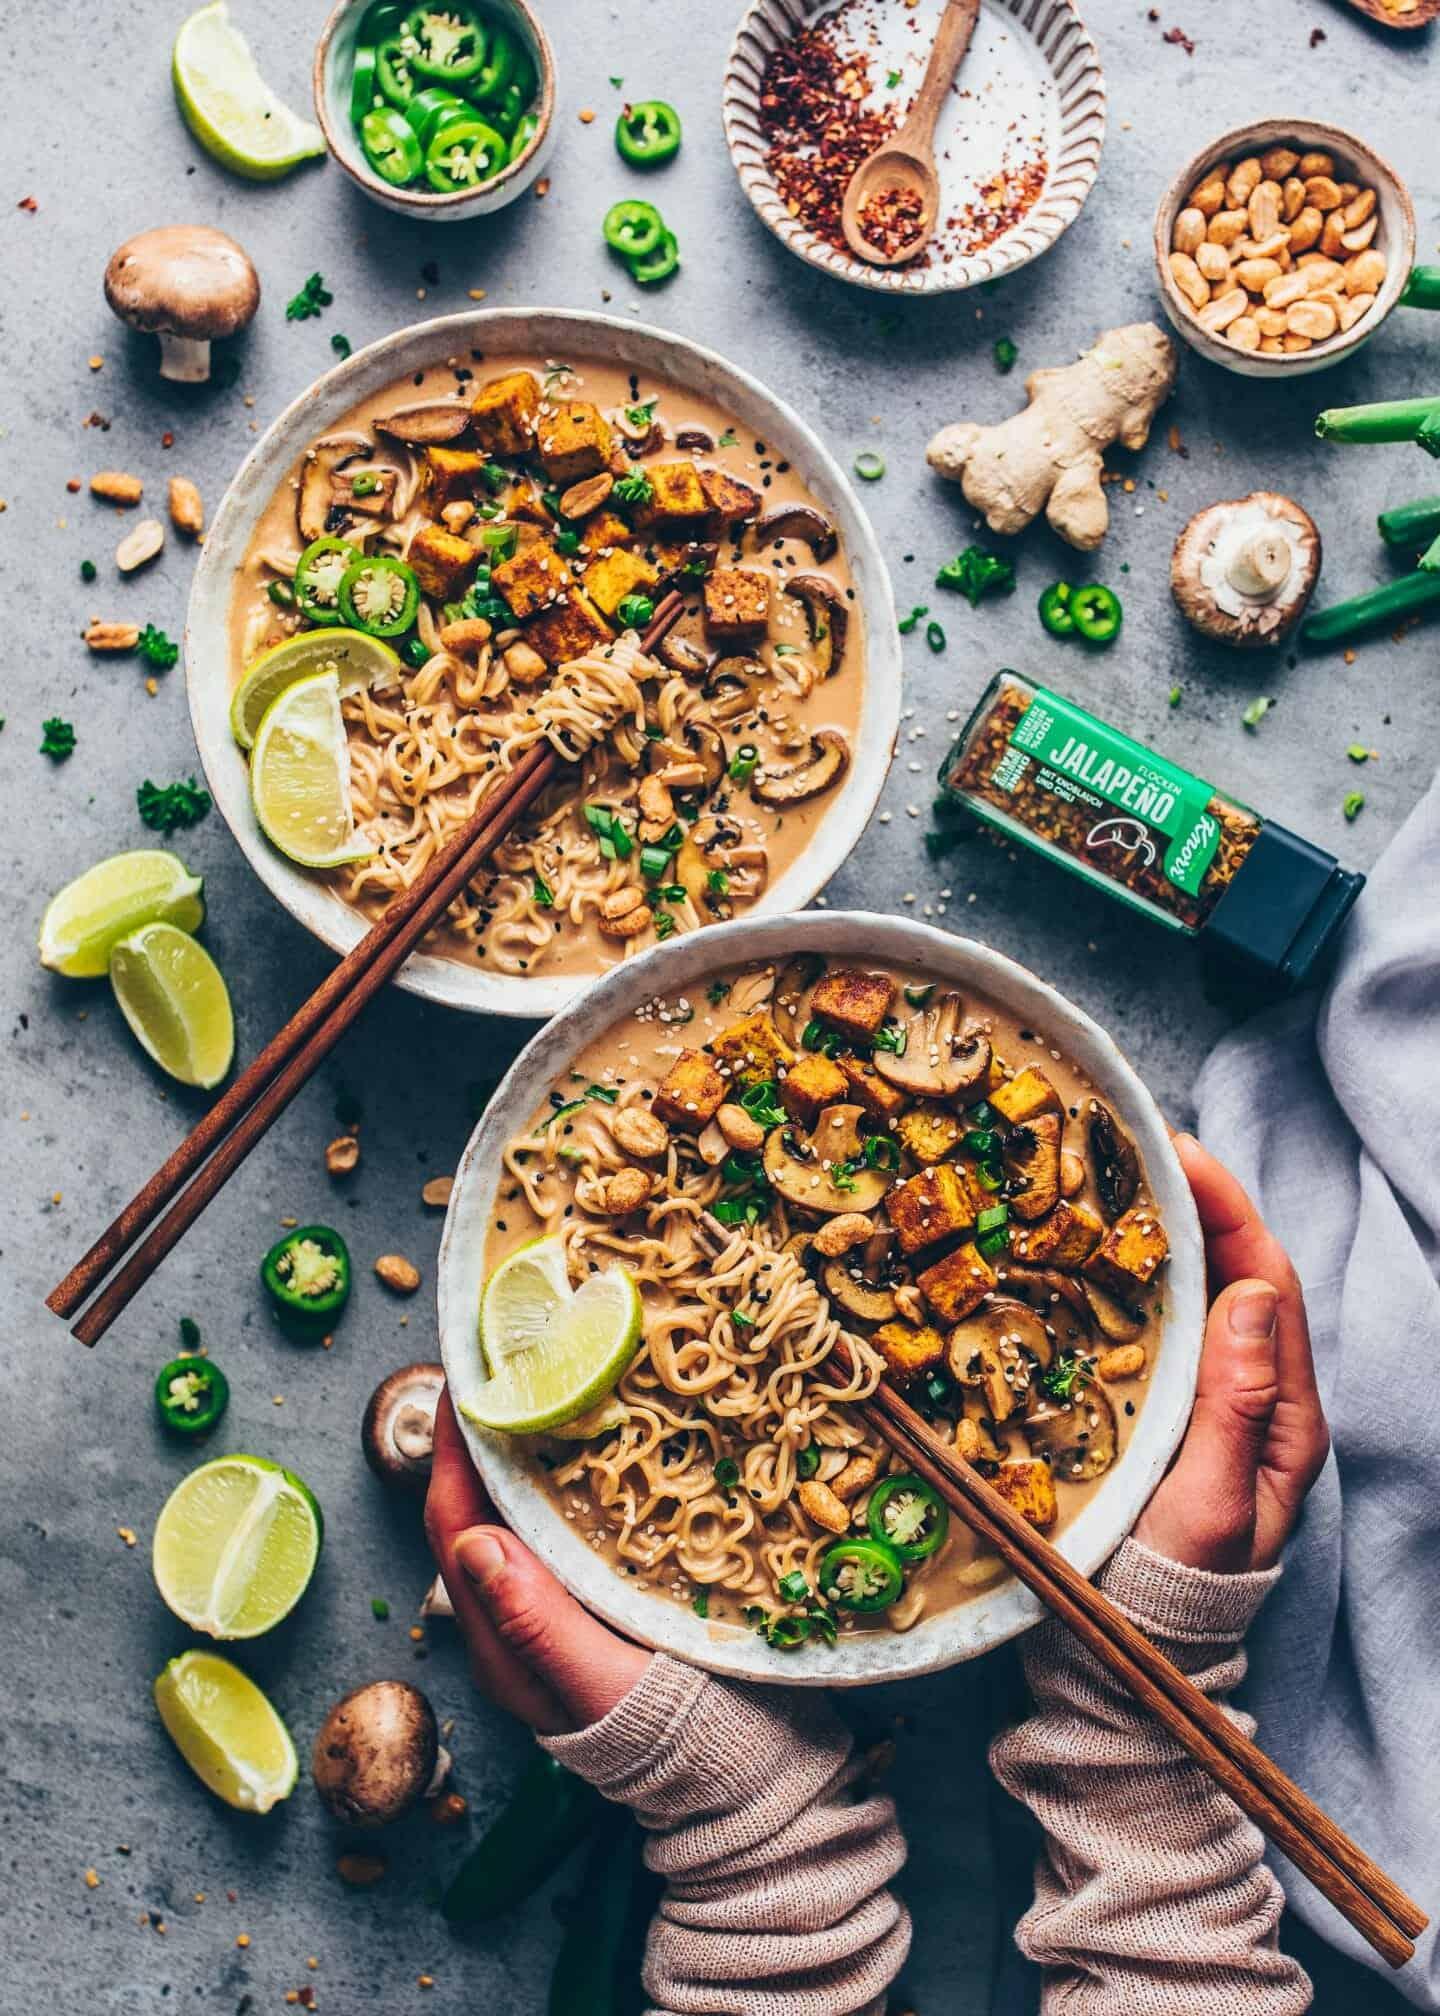 Thai-Erdnuss-Nudelsuppe. Cremiges Kokos-Curry, gebratenene Pilze, knuspriger Tofu. Japanische Vegane Ramen-Suppe, 20 Minuten Rezept.